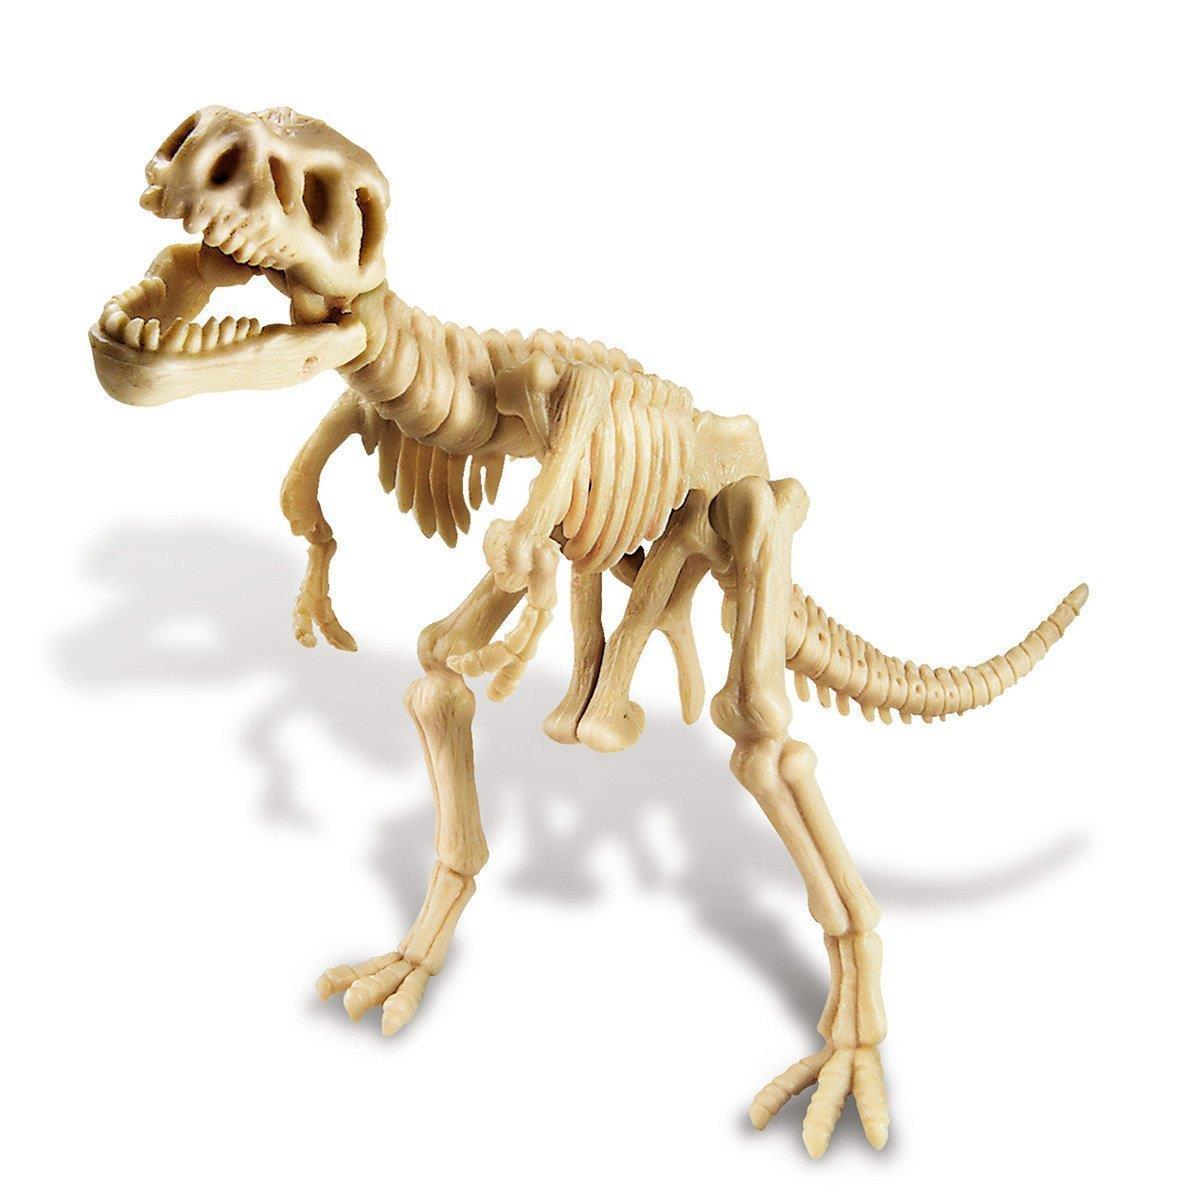 Kids Labs Dig A Trex Skeleton